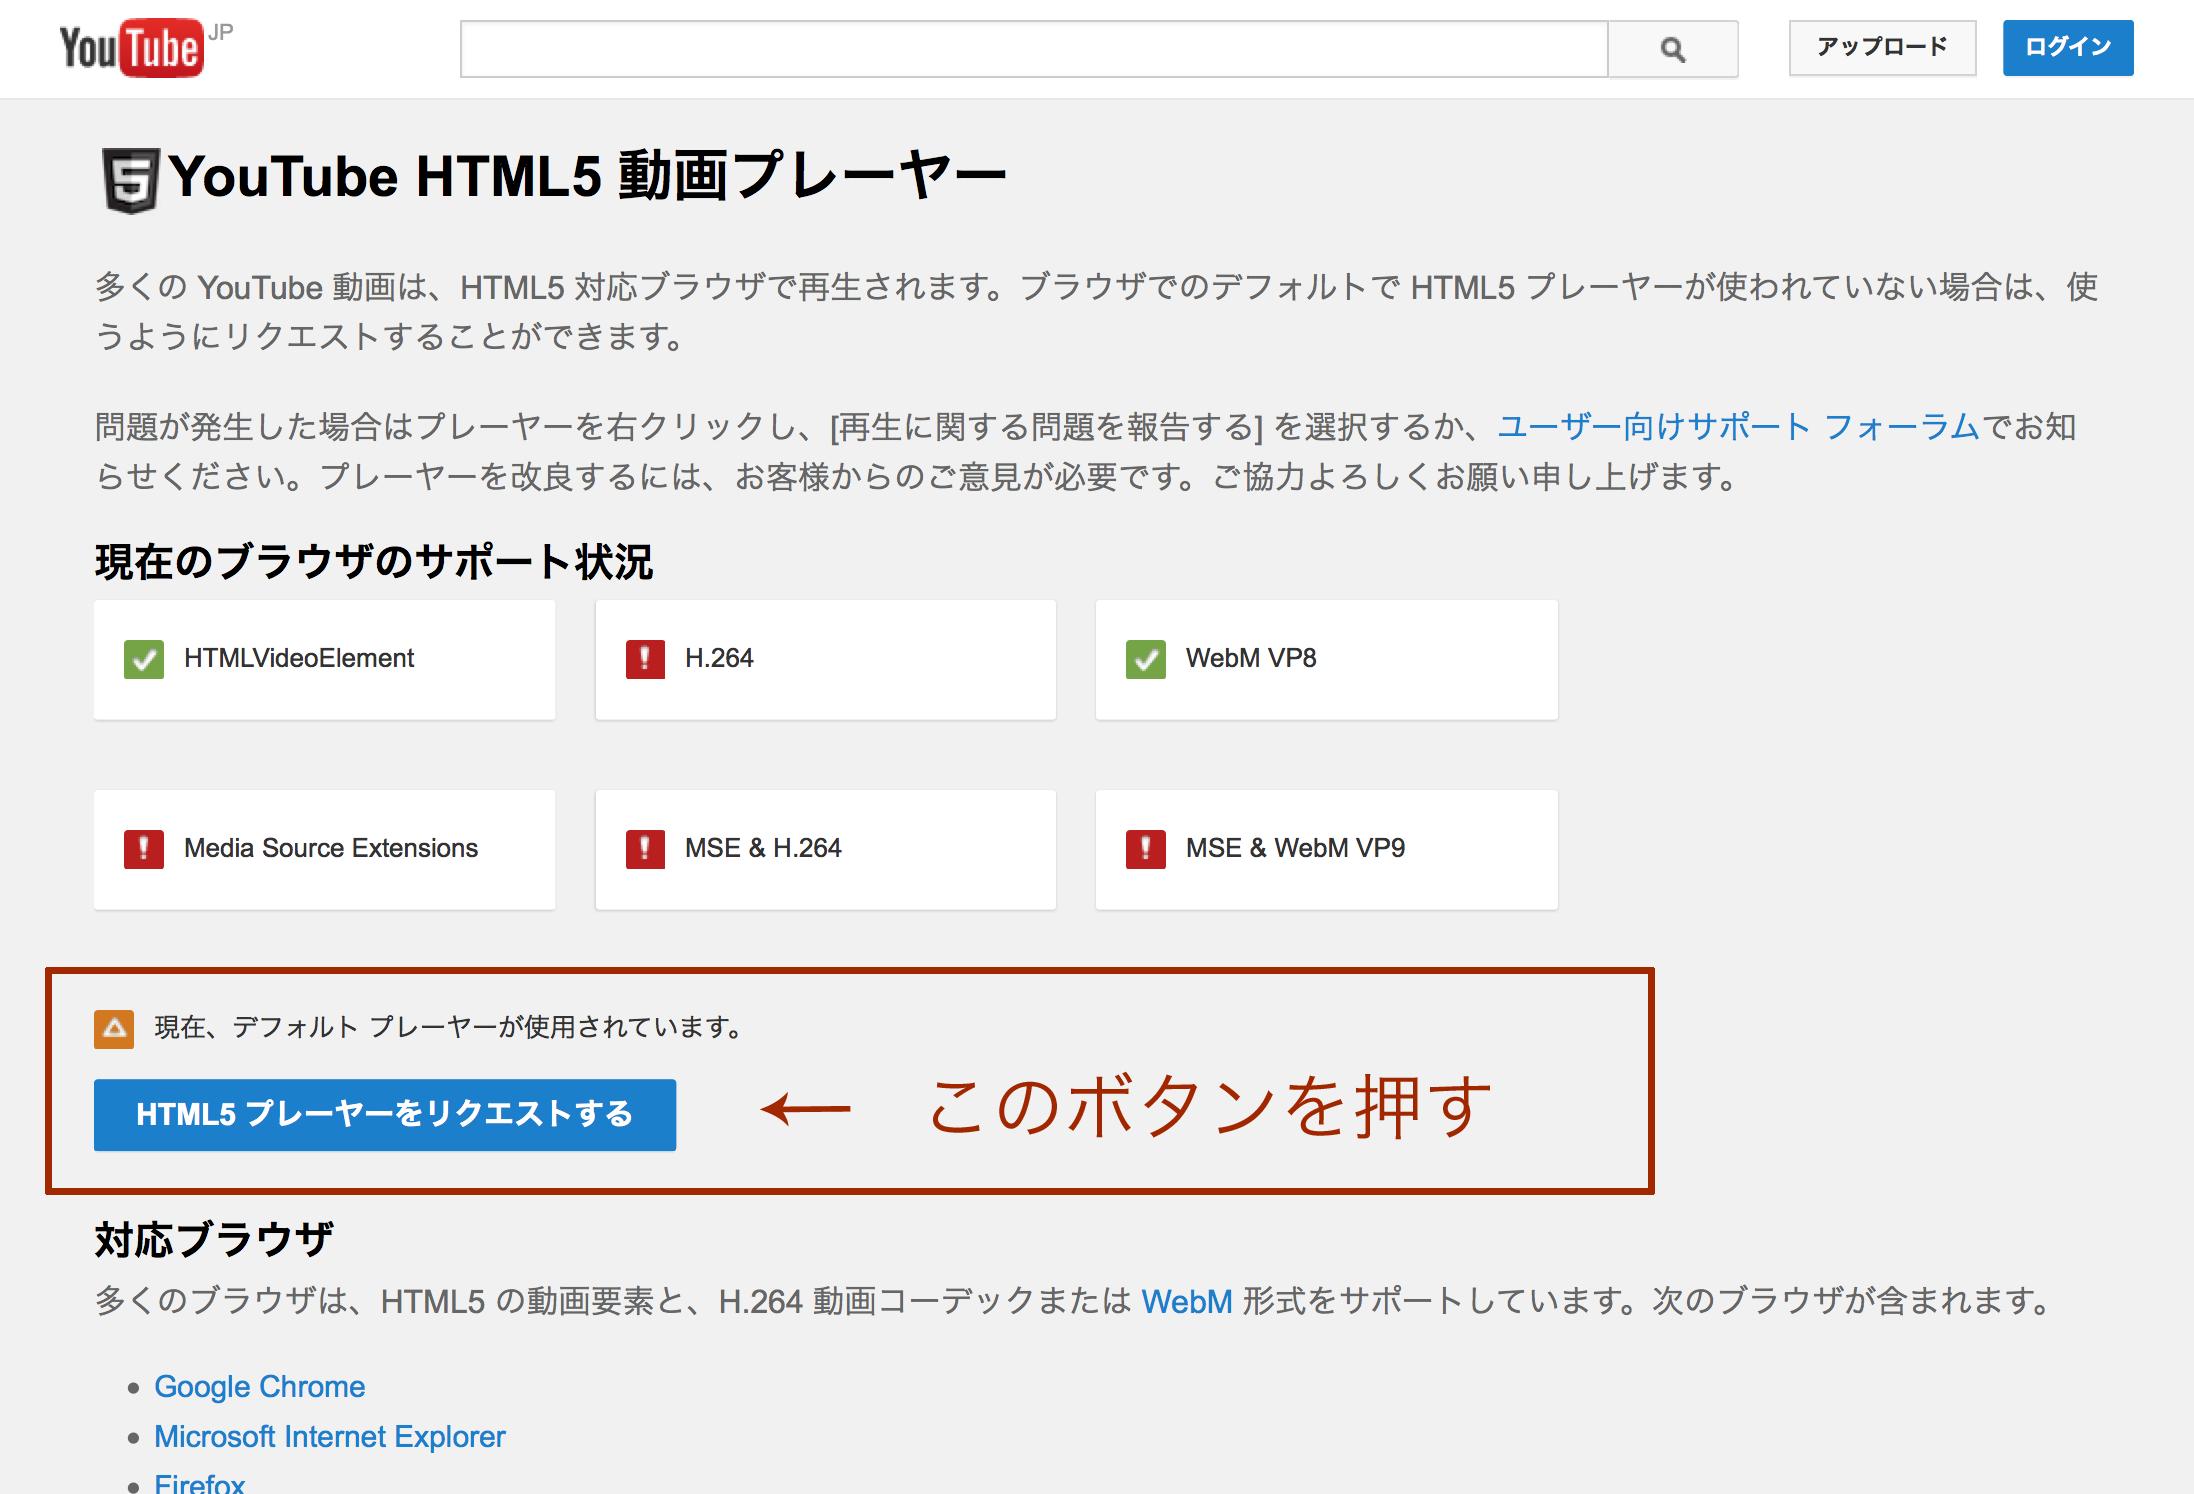 「YouTube HTML5 動画プレーヤー」ページ